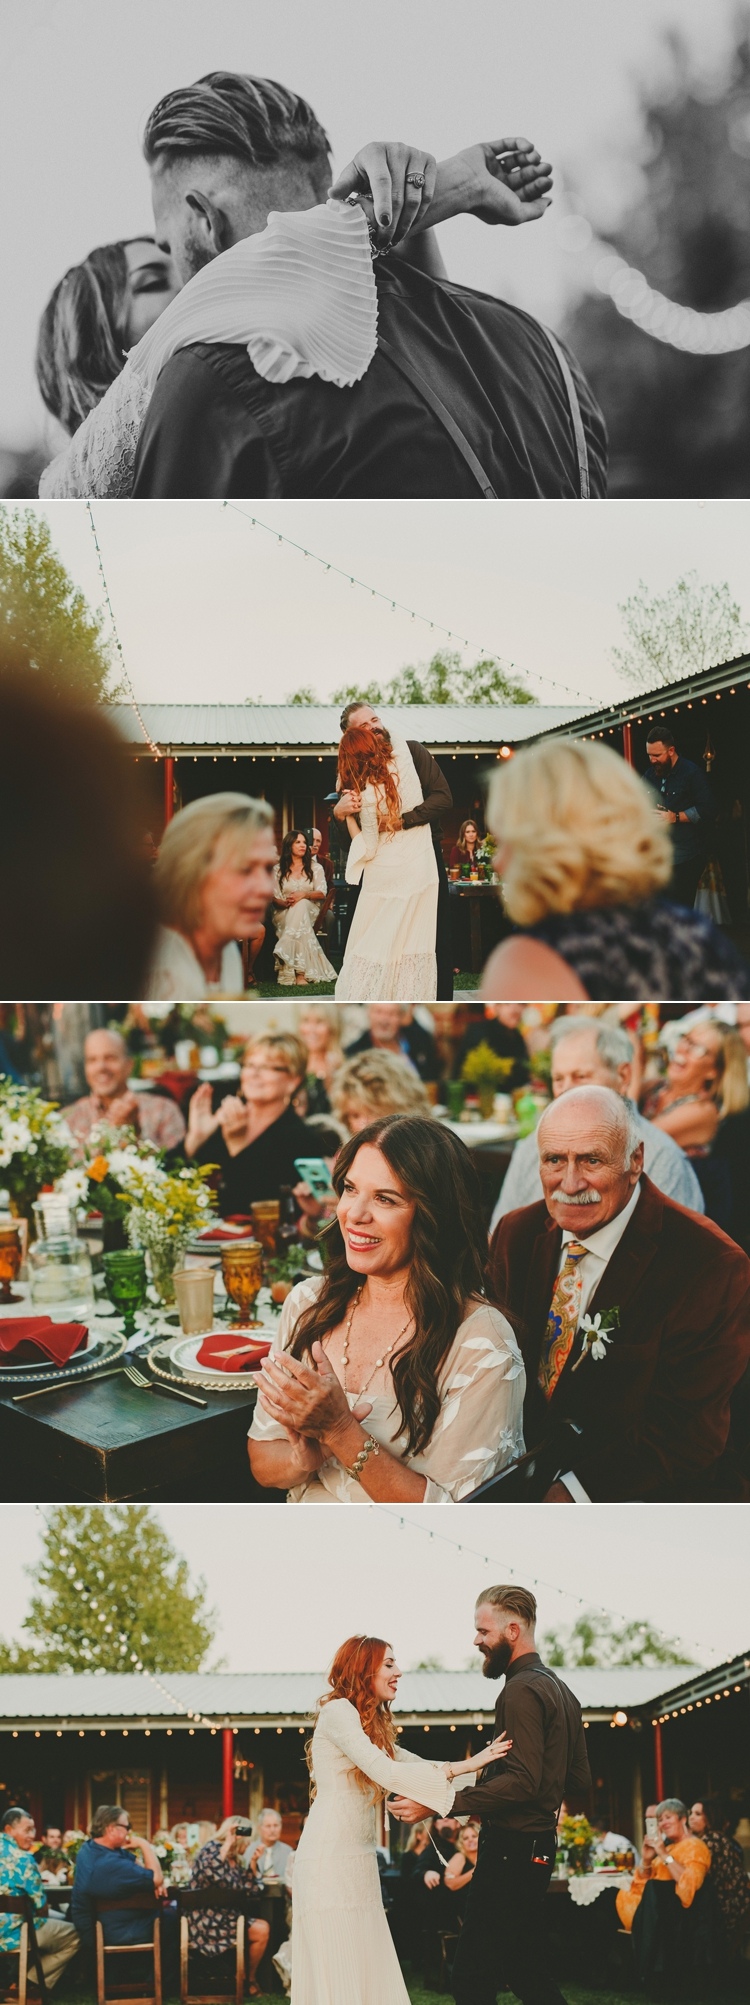 woodstock-inspired-wedding-photos-29